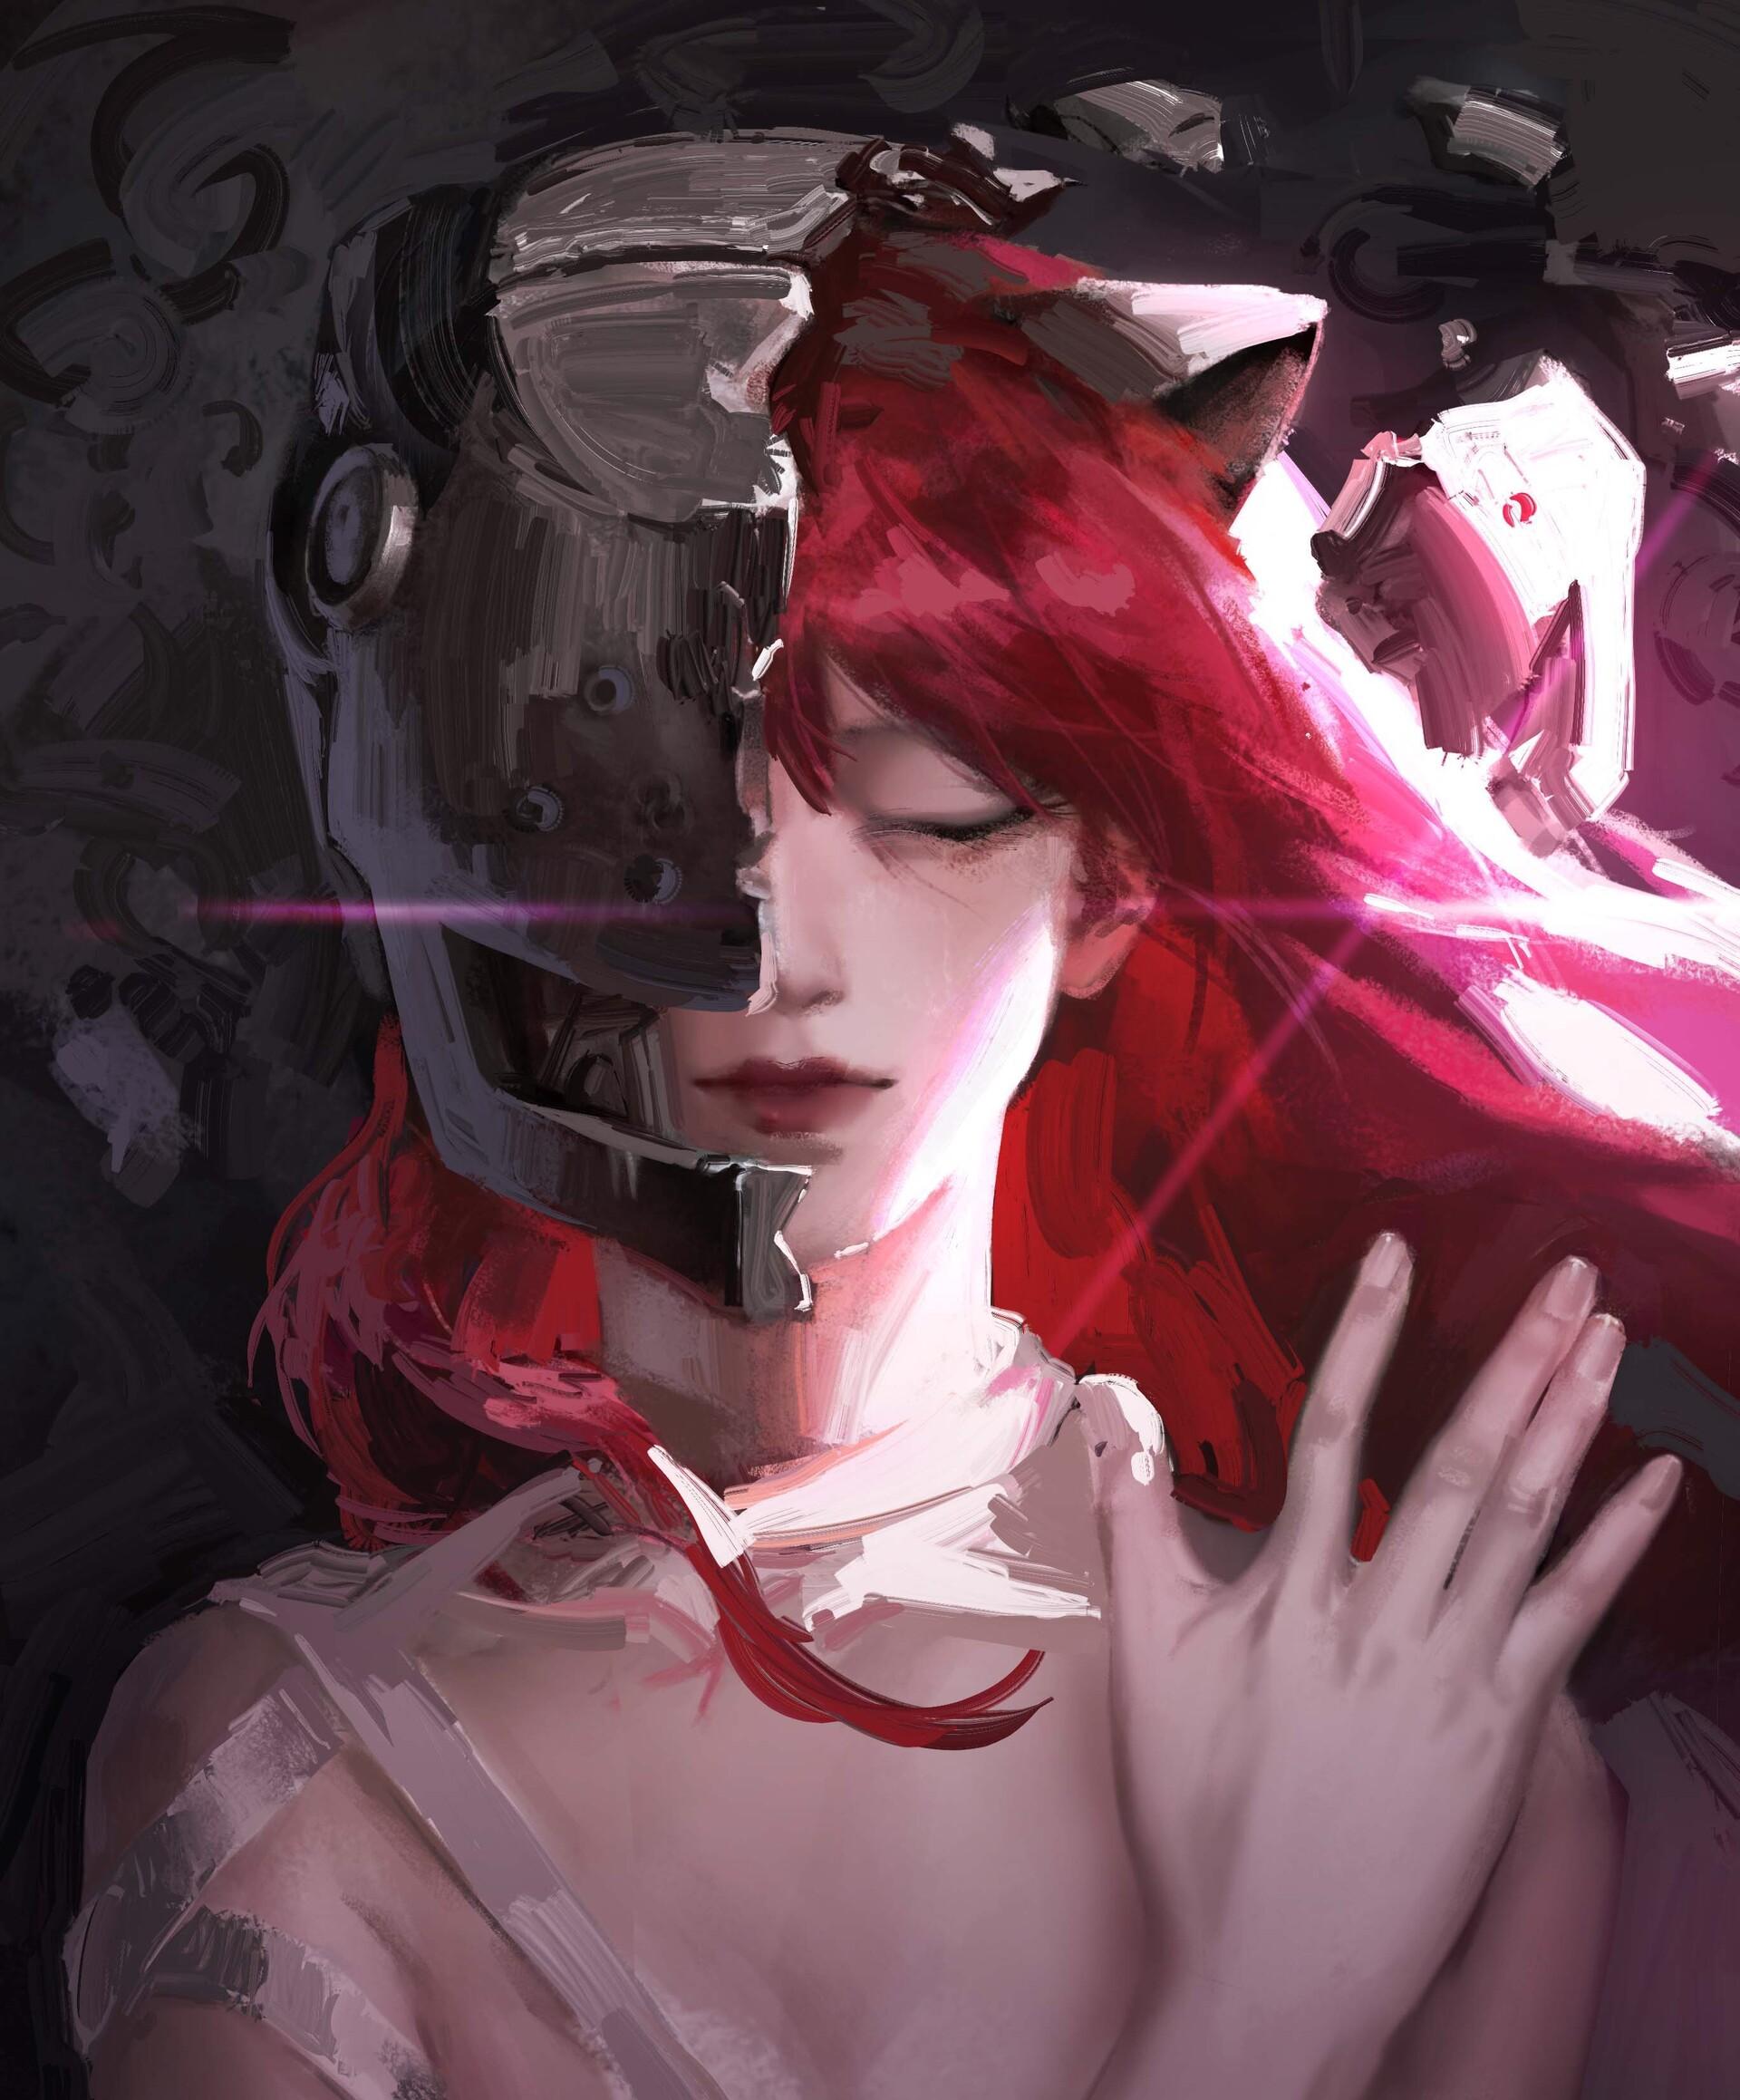 Anime 1920x2317 artwork digital art anime anime girls Elfen Lied Lucy (Elfen Lied) cat ears mask redhead long hair